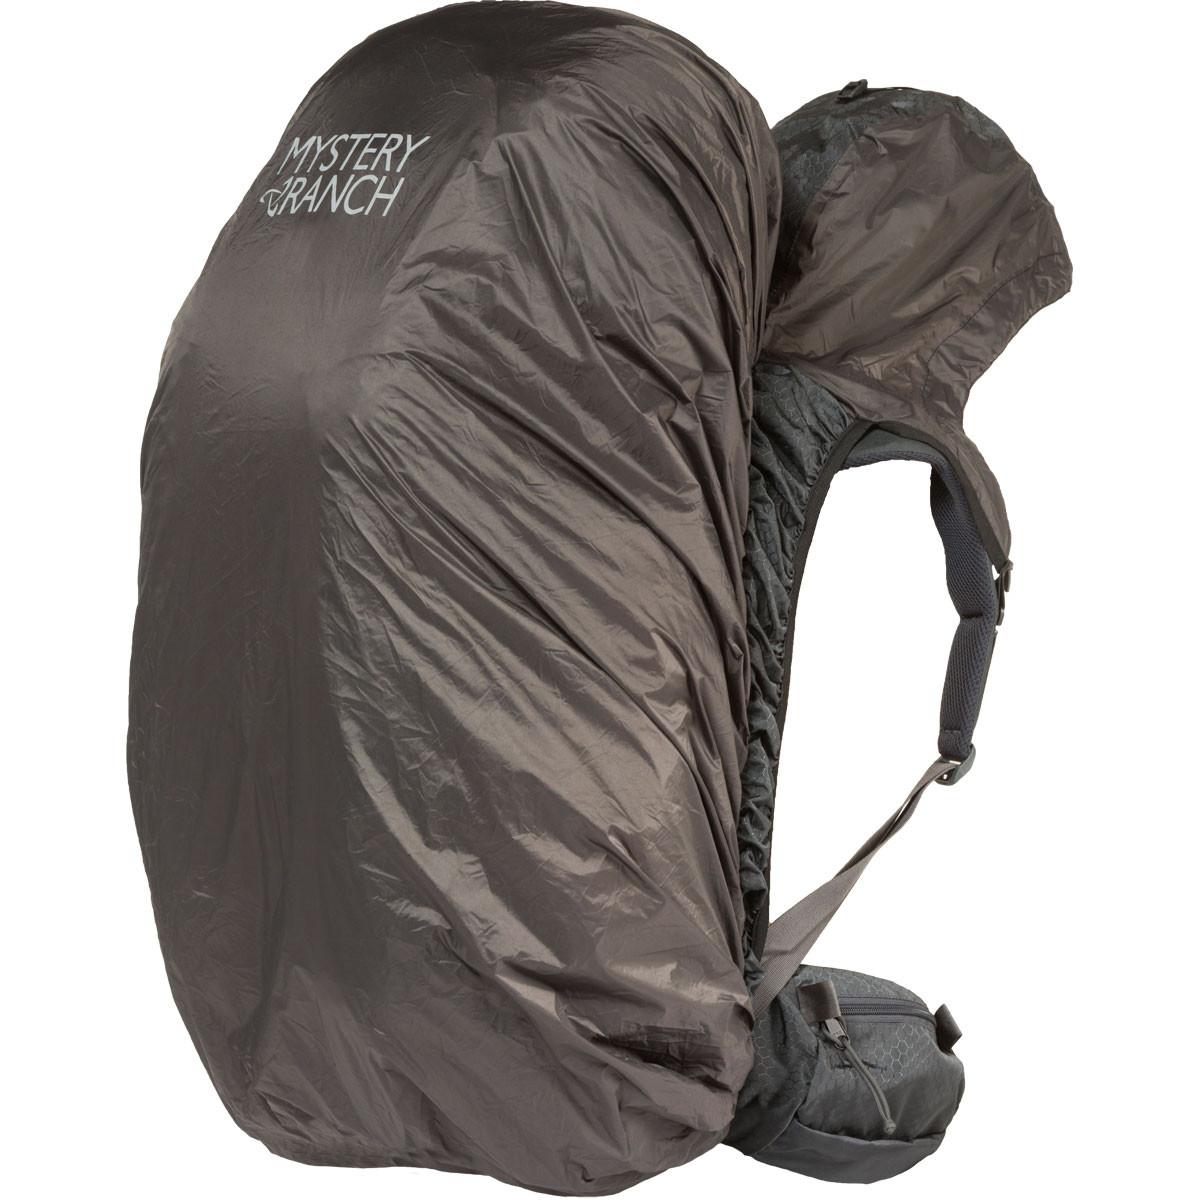 MYSTERY RANCH神秘農場EX HOODED PACK FLY連帽背包套炭灰L 70-105L